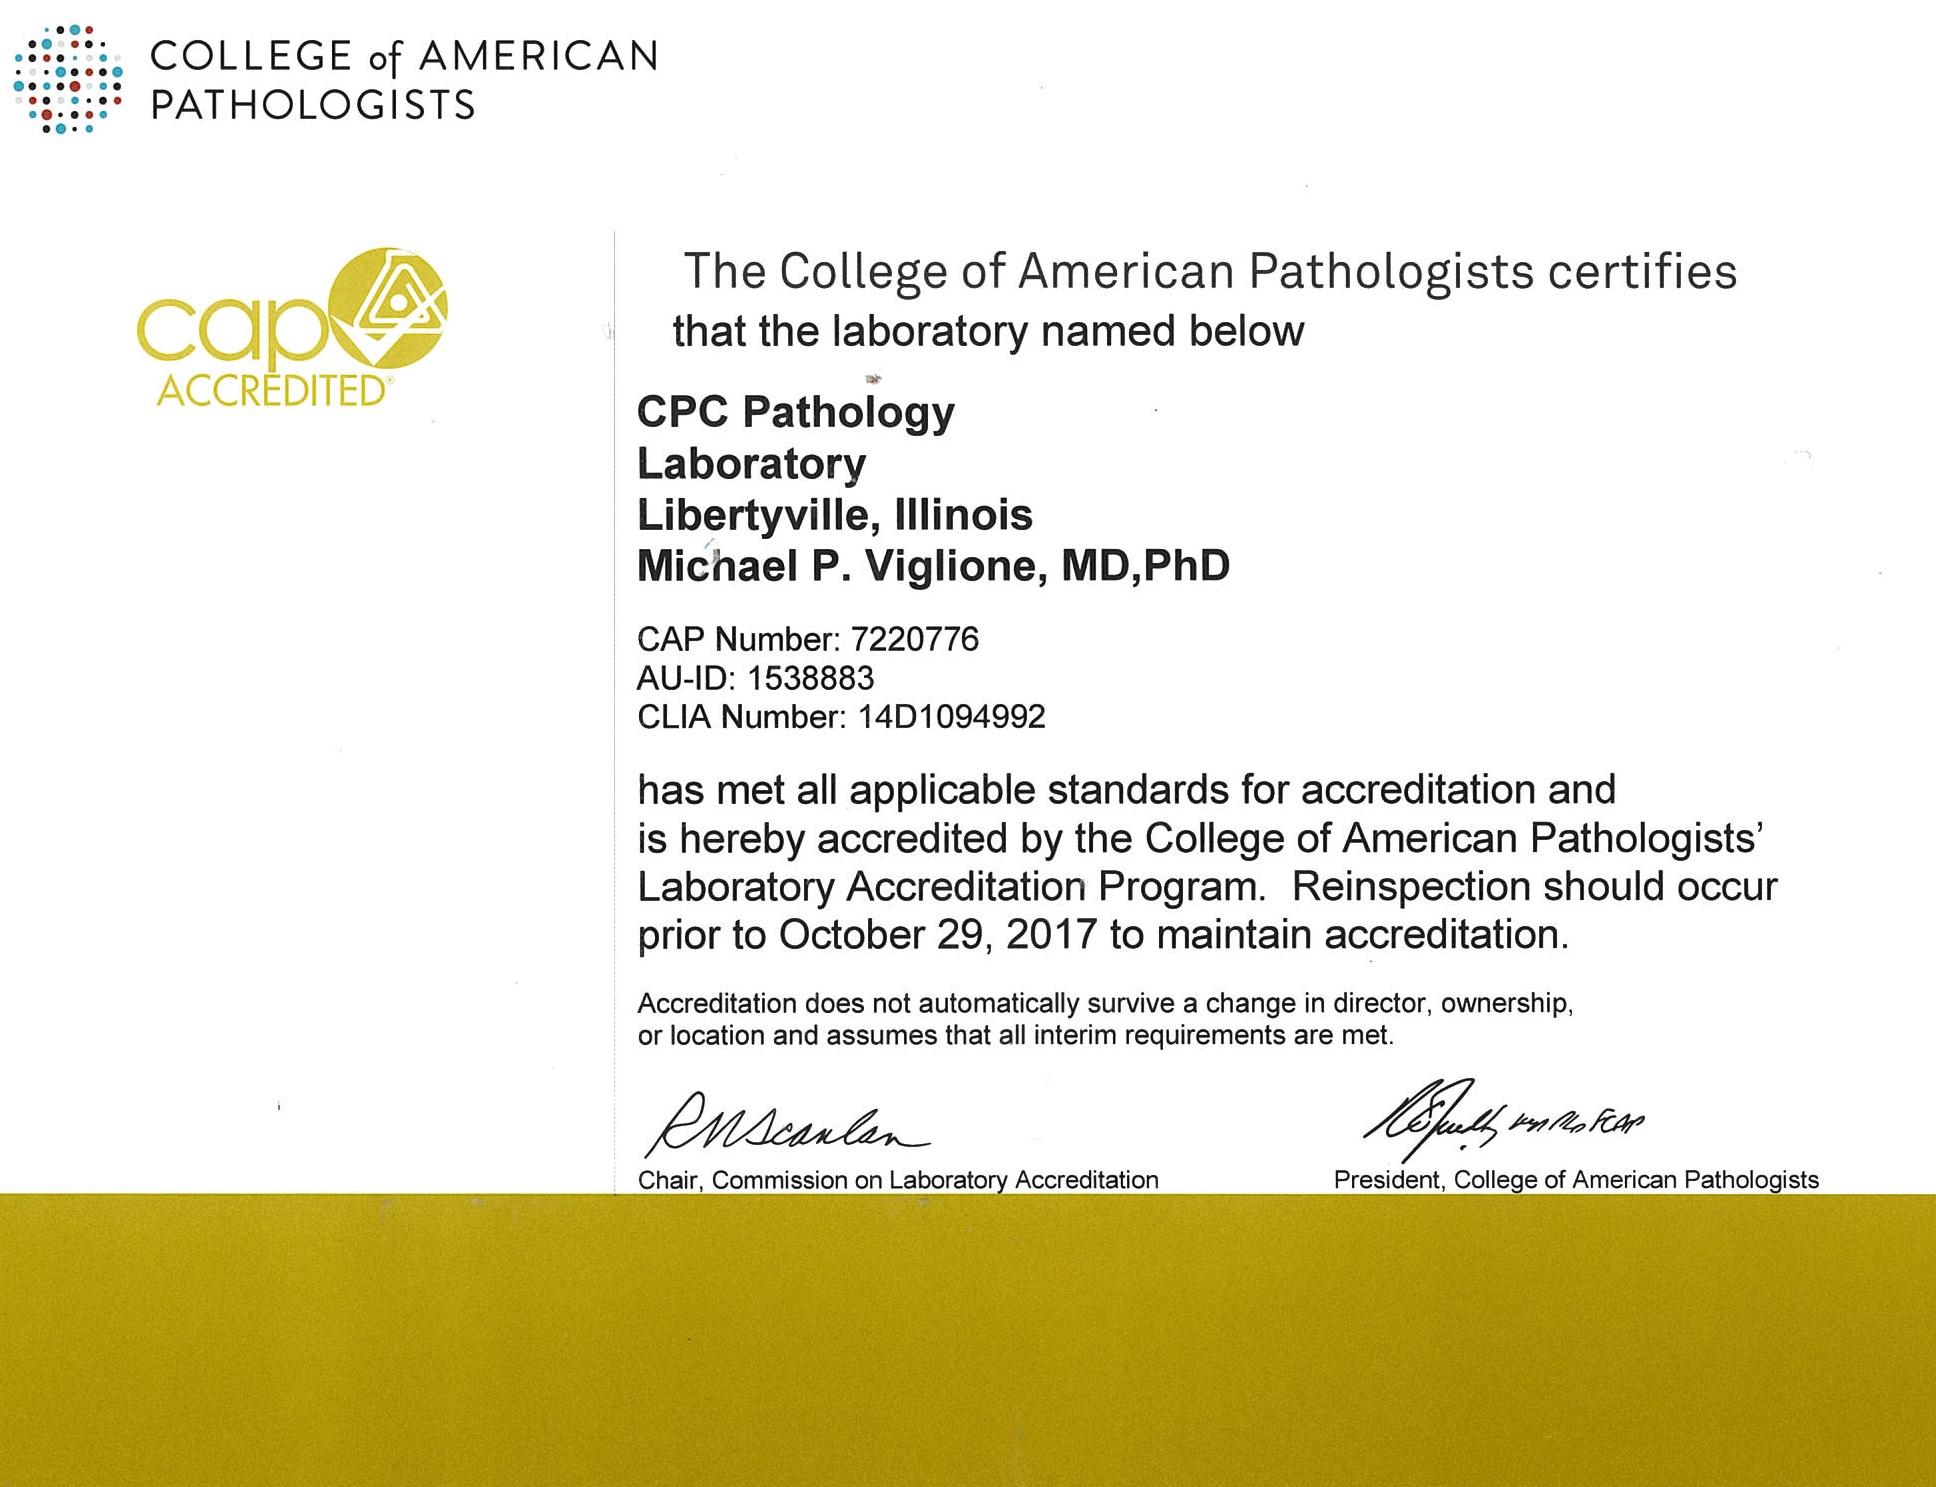 cap accreditation certificate 1936 pathology